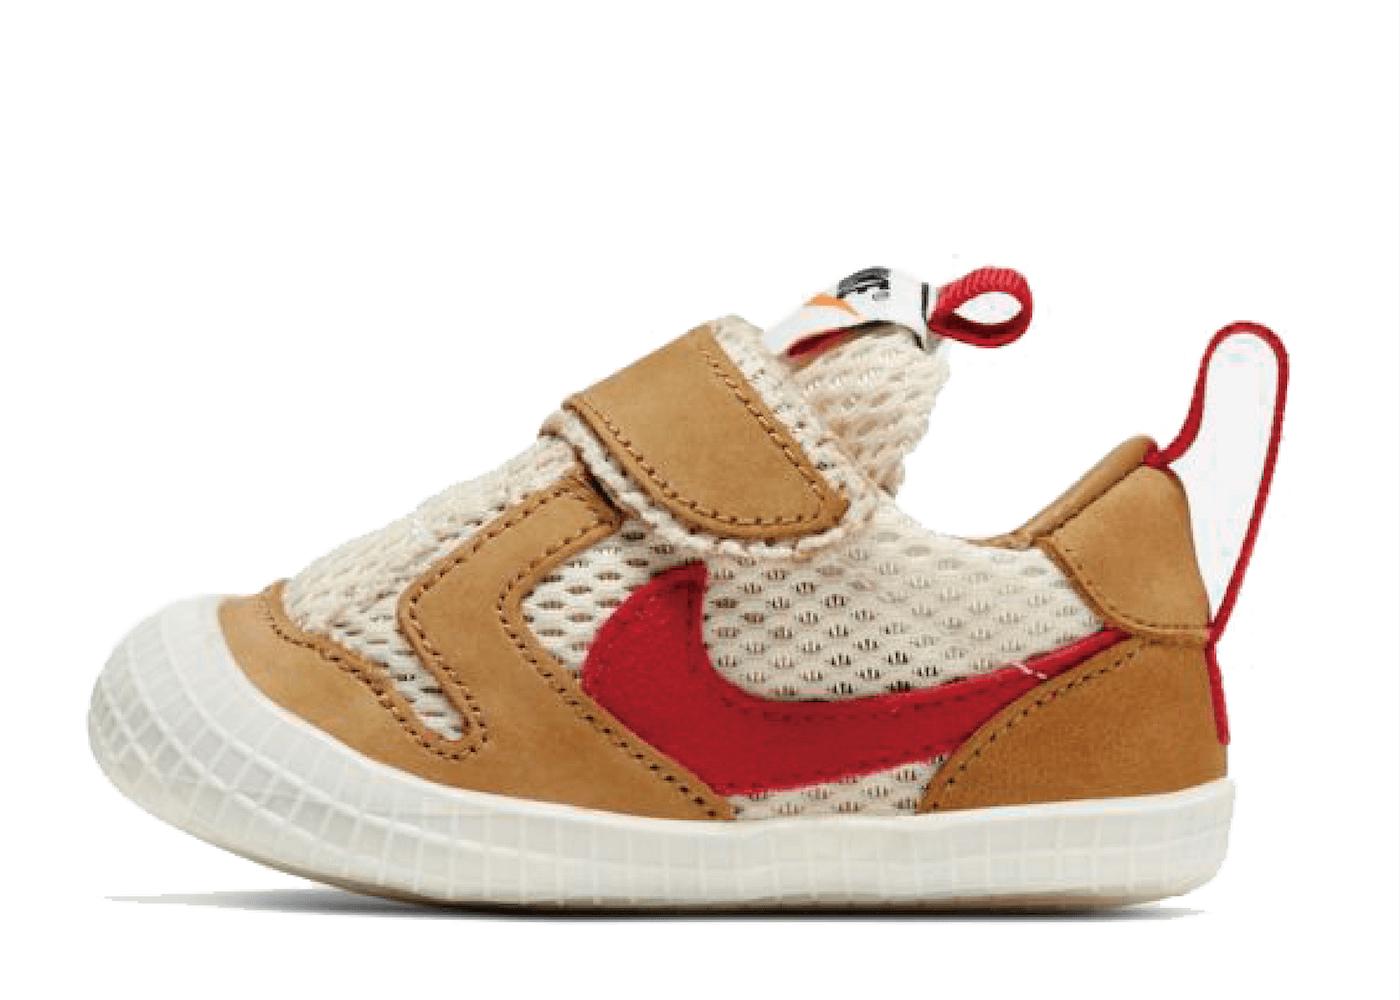 Nike Mars Yard 2.0 Tom Sachs Infantsの写真